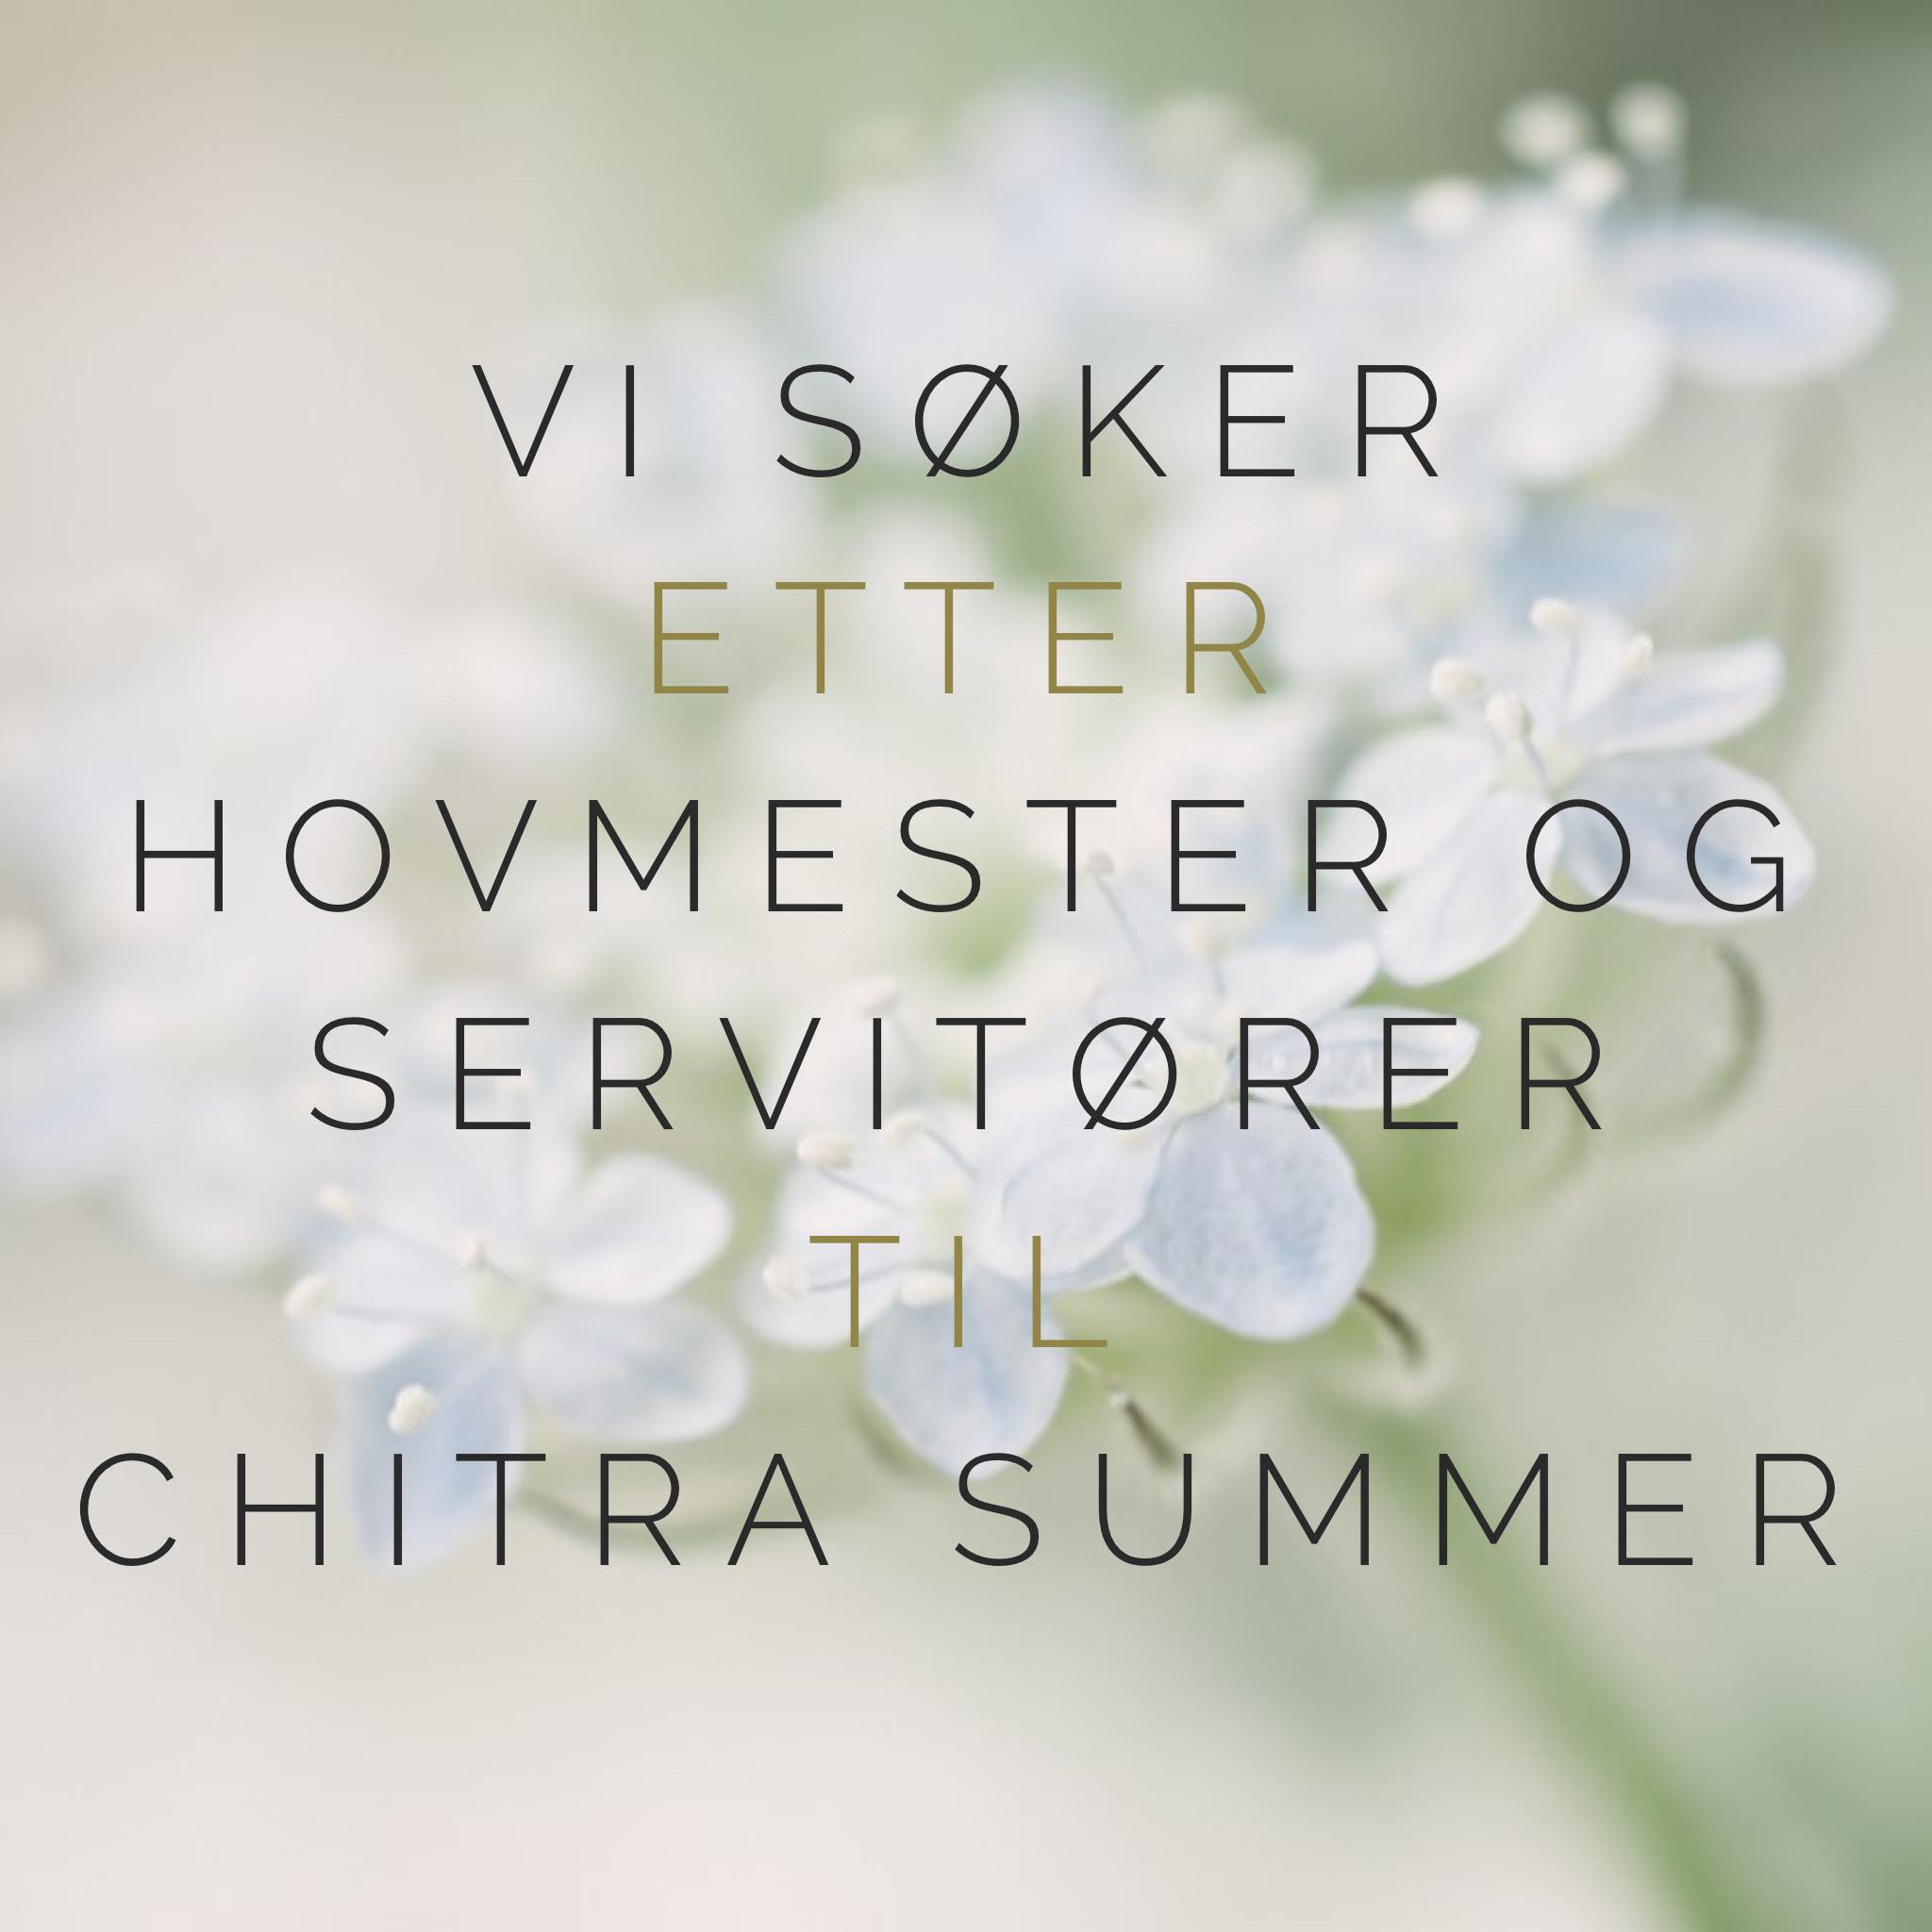 servitører chitra summer.png